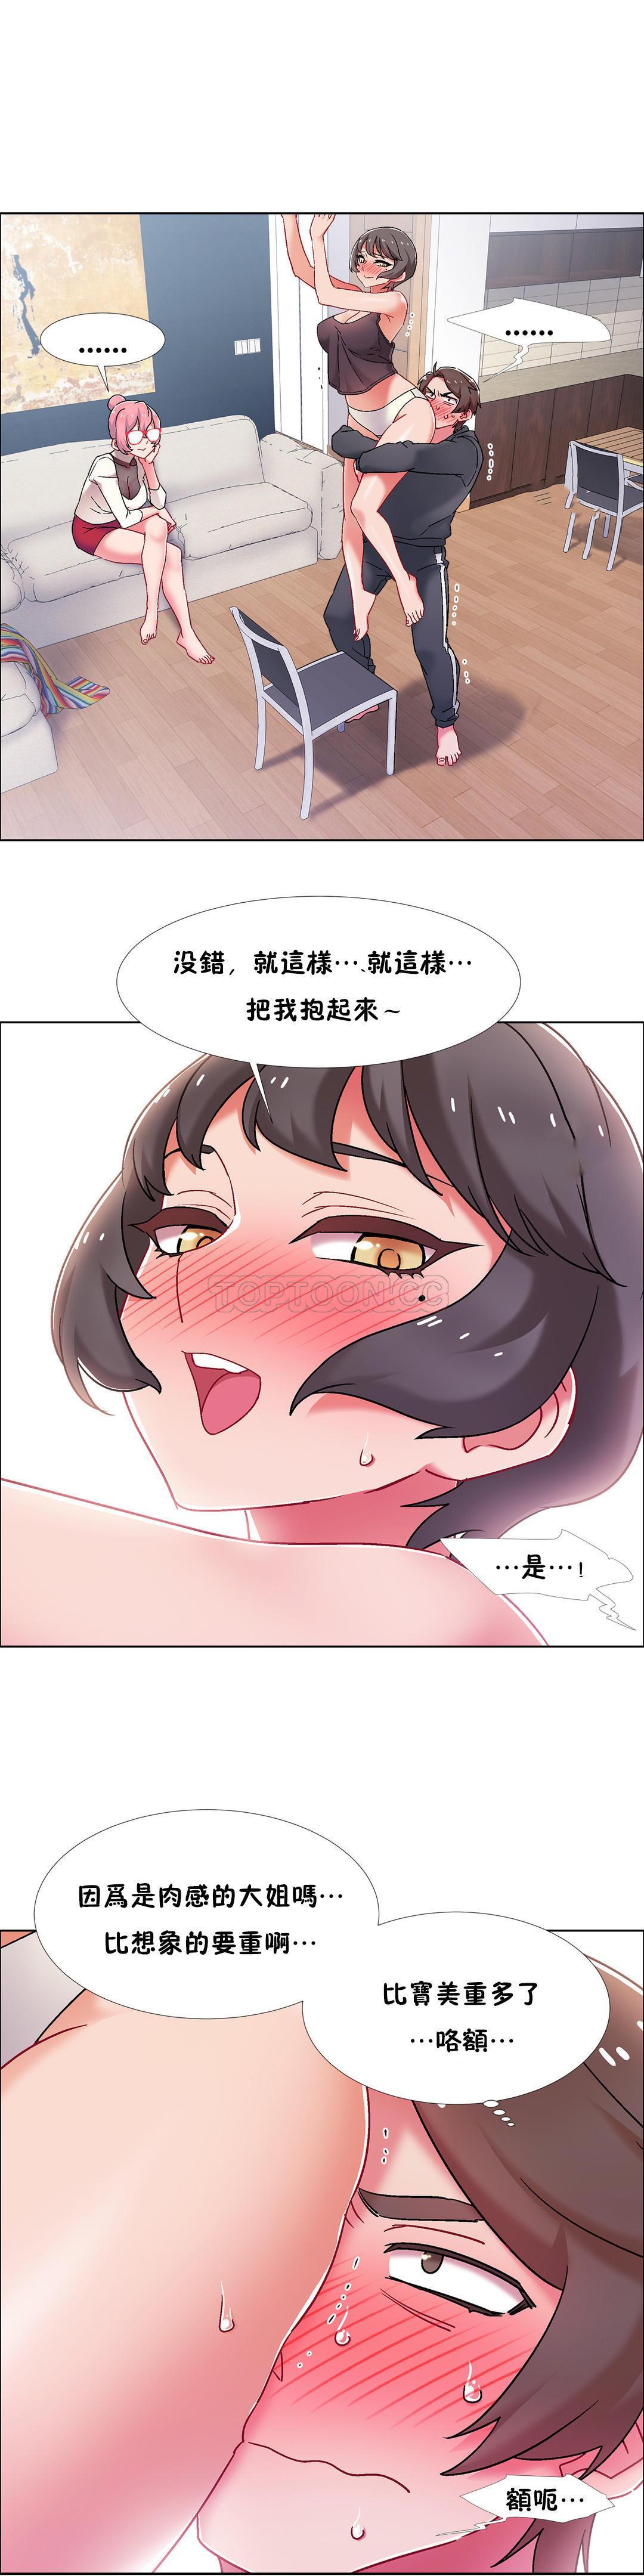 [Studio Wannabe] Rental Girls | 出租女郎 Ch. 33-58 [Chinese]  第二季 完结 306